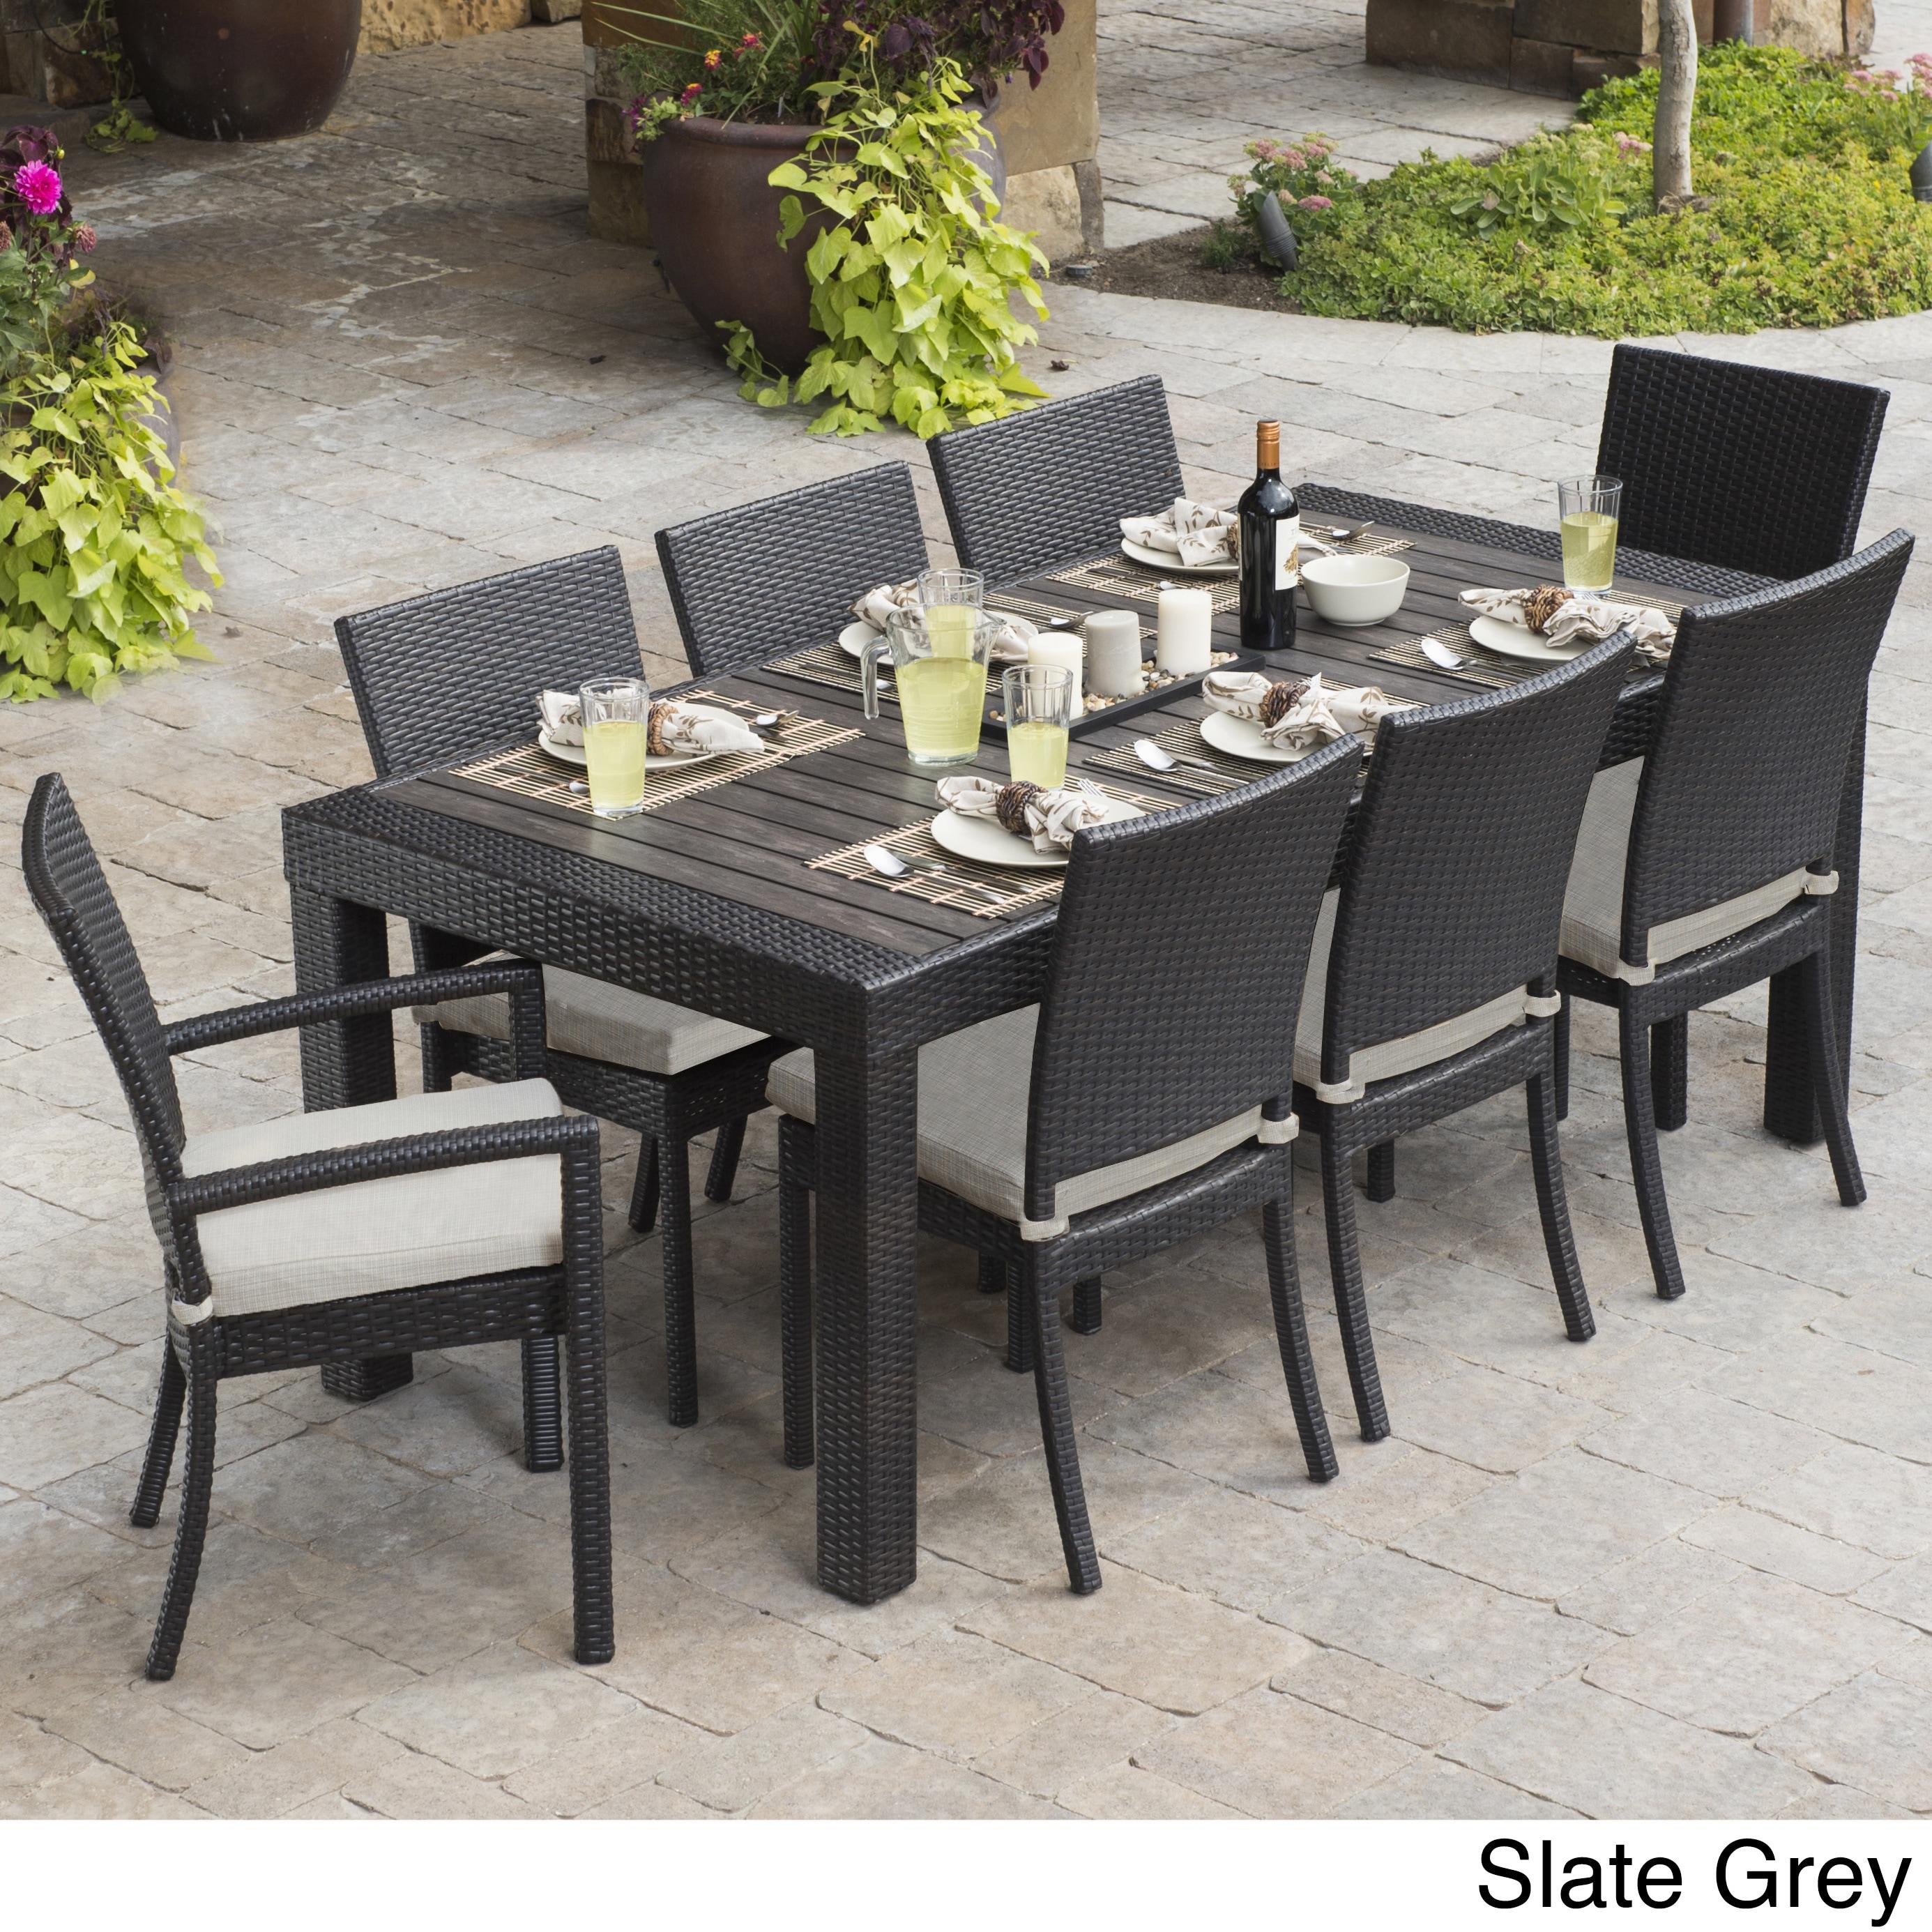 Rst Brands Deco 9 Piece Dining Set Patio Furniture